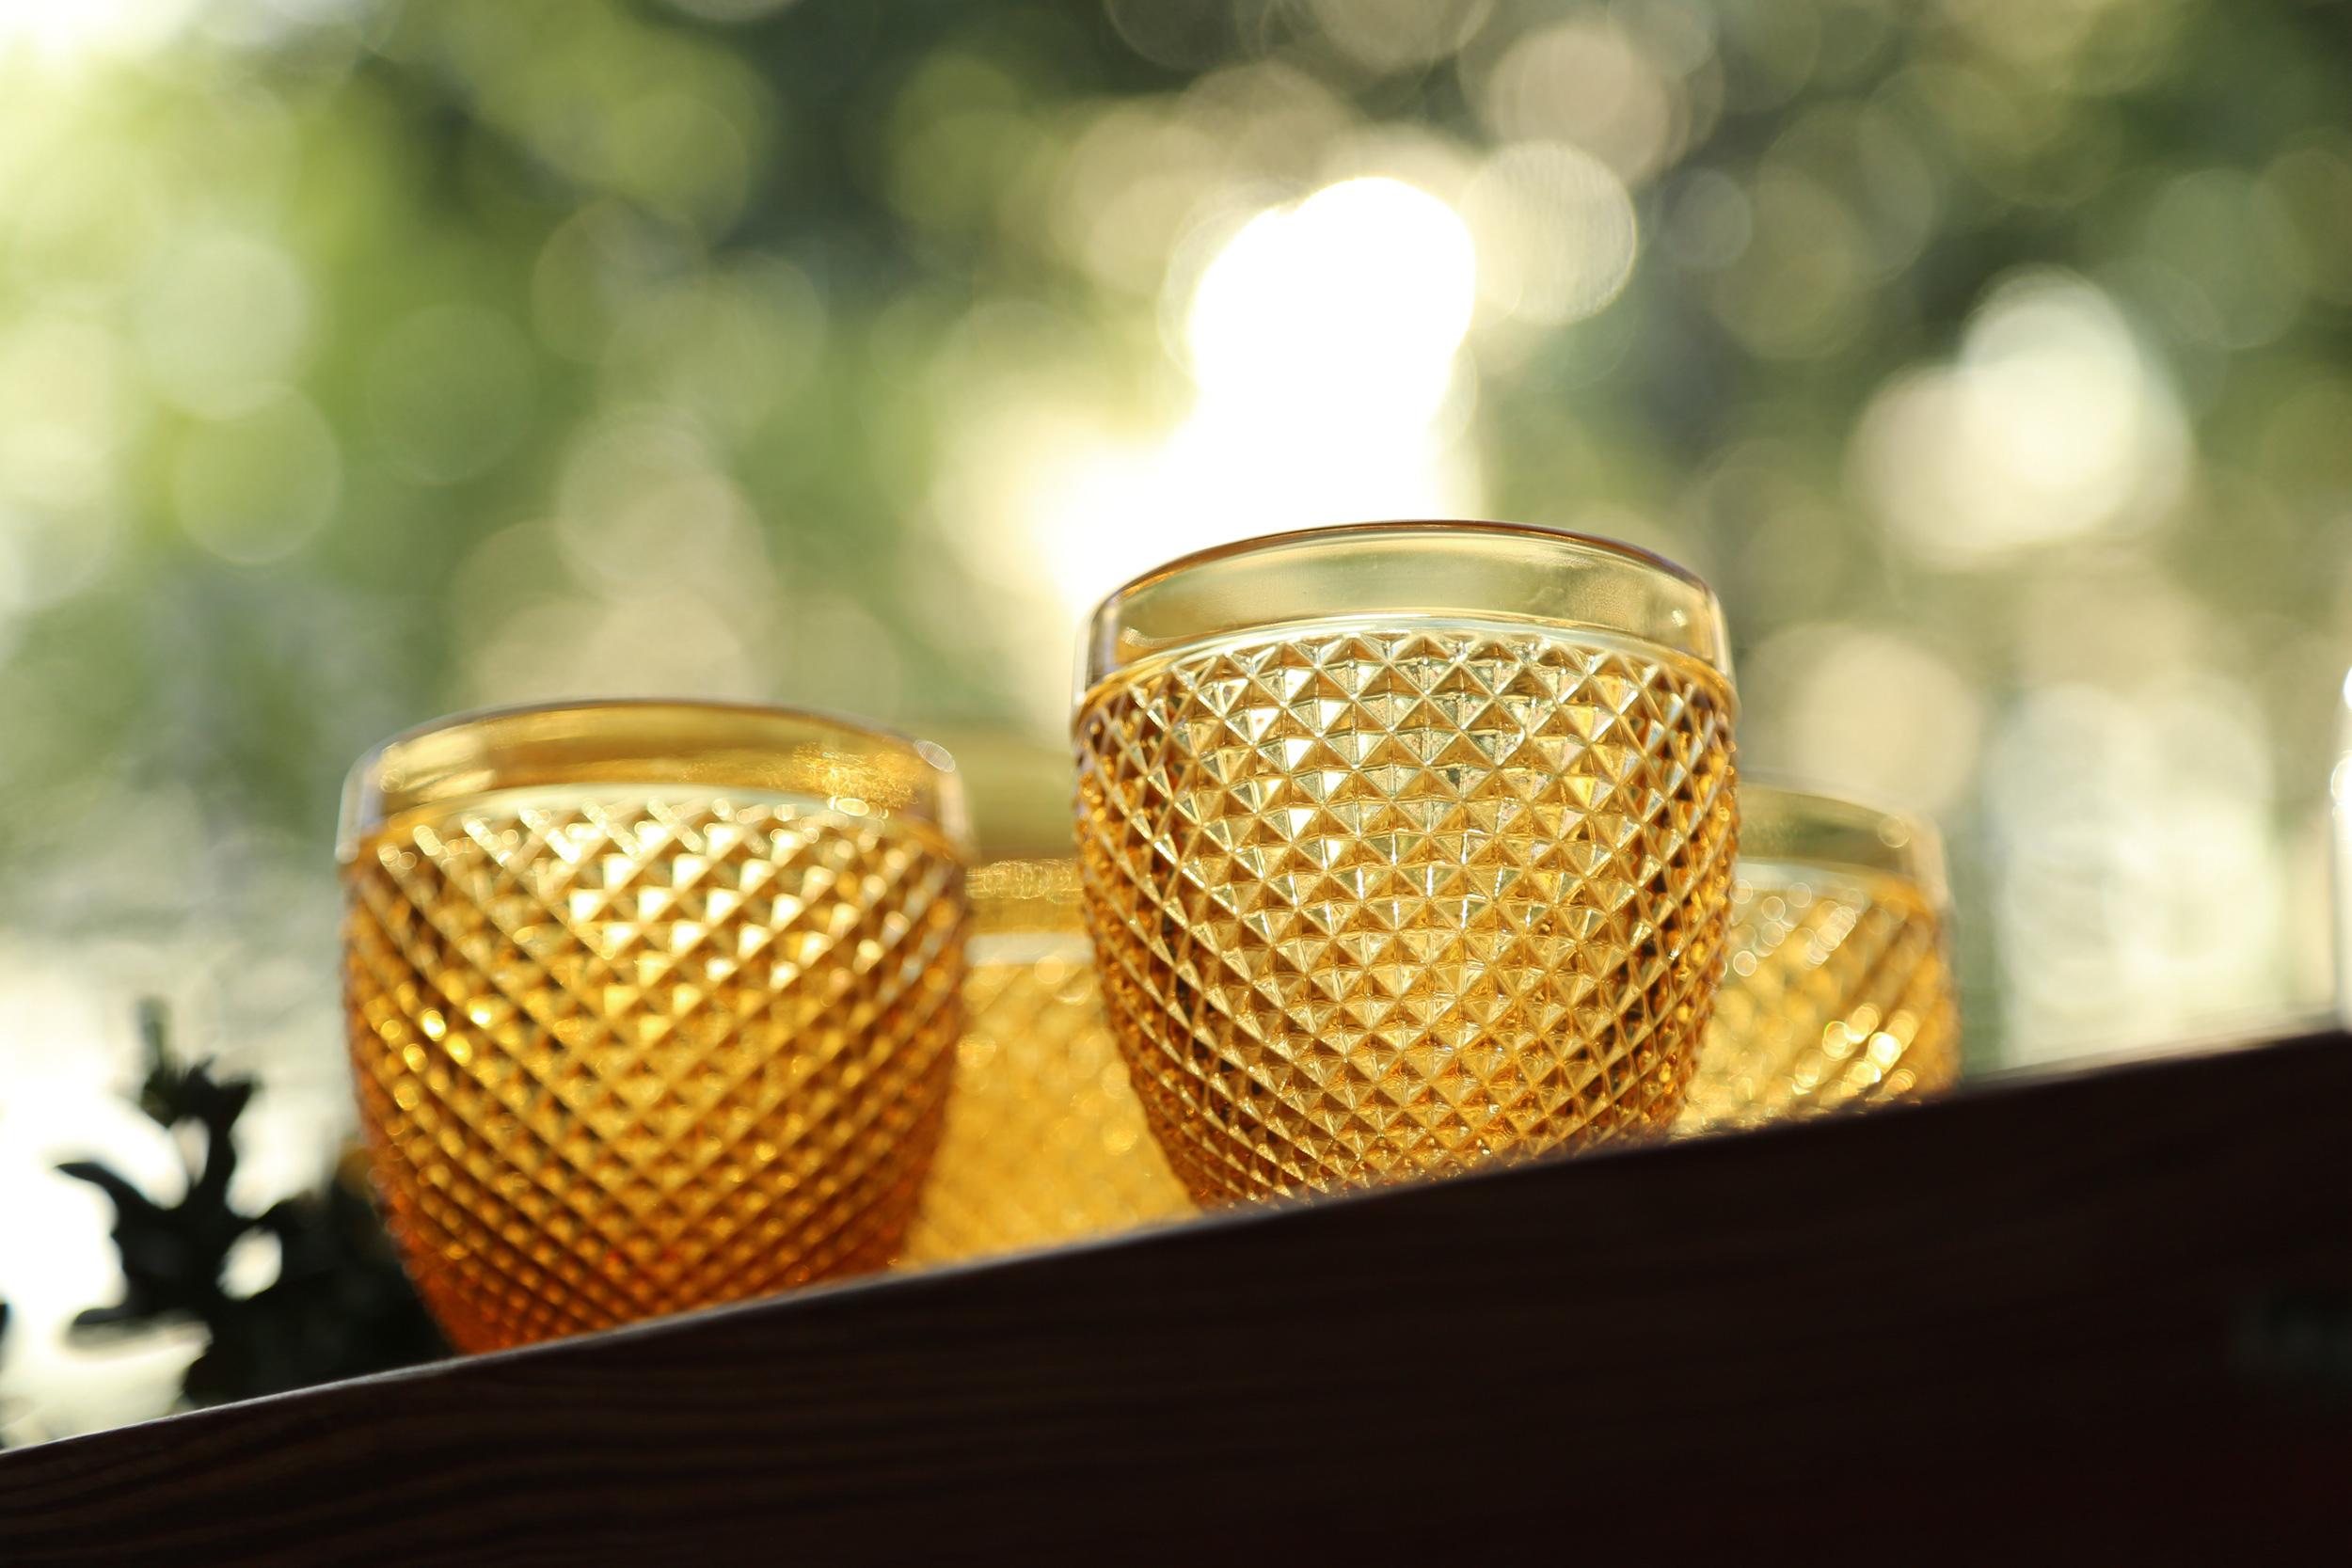 glass-details_14.jpg